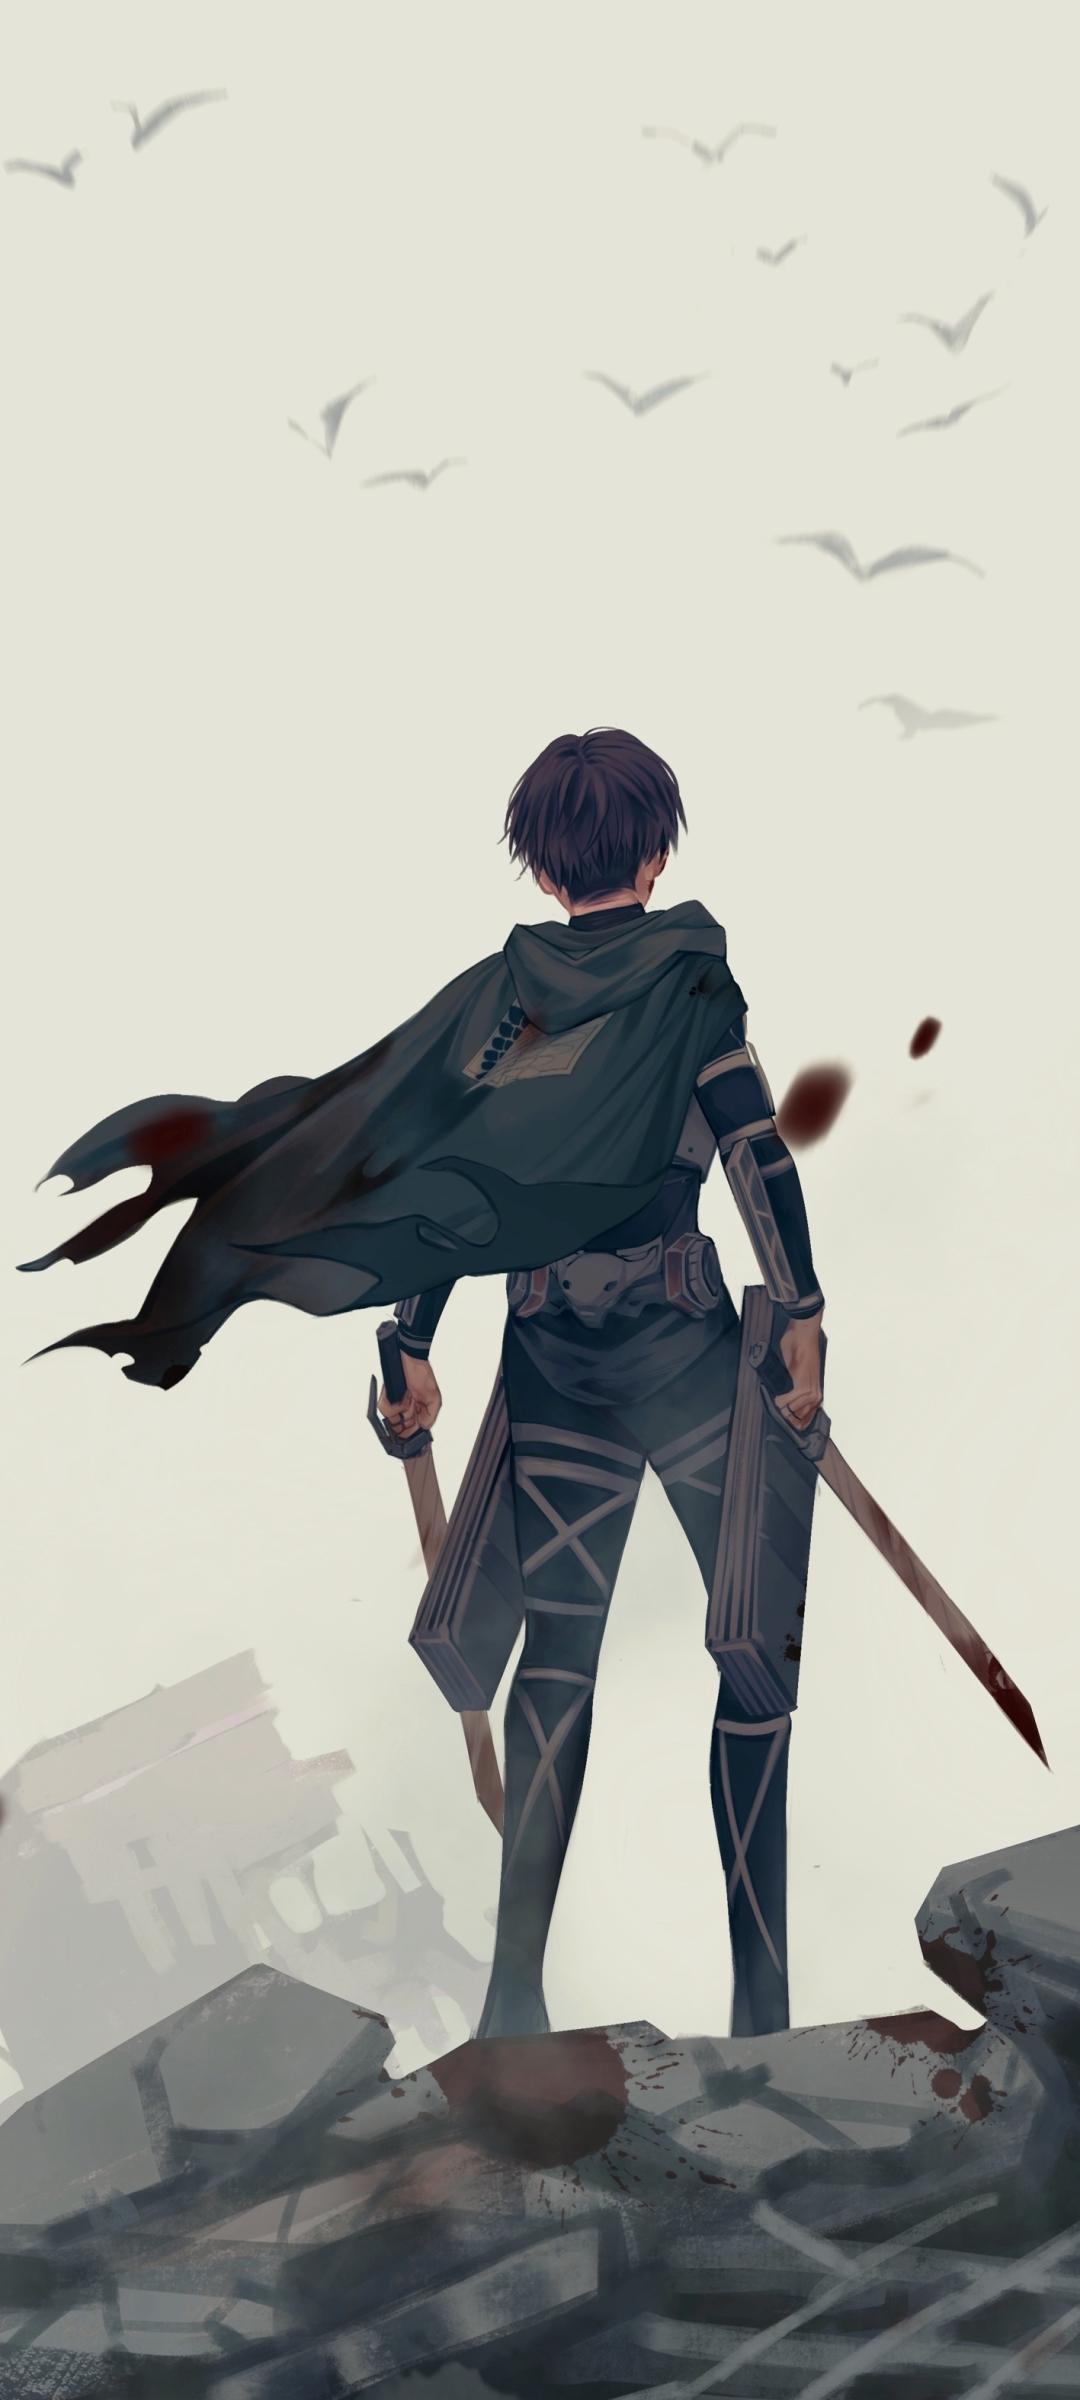 Anime Attack On Titan Uhd Wallpaper